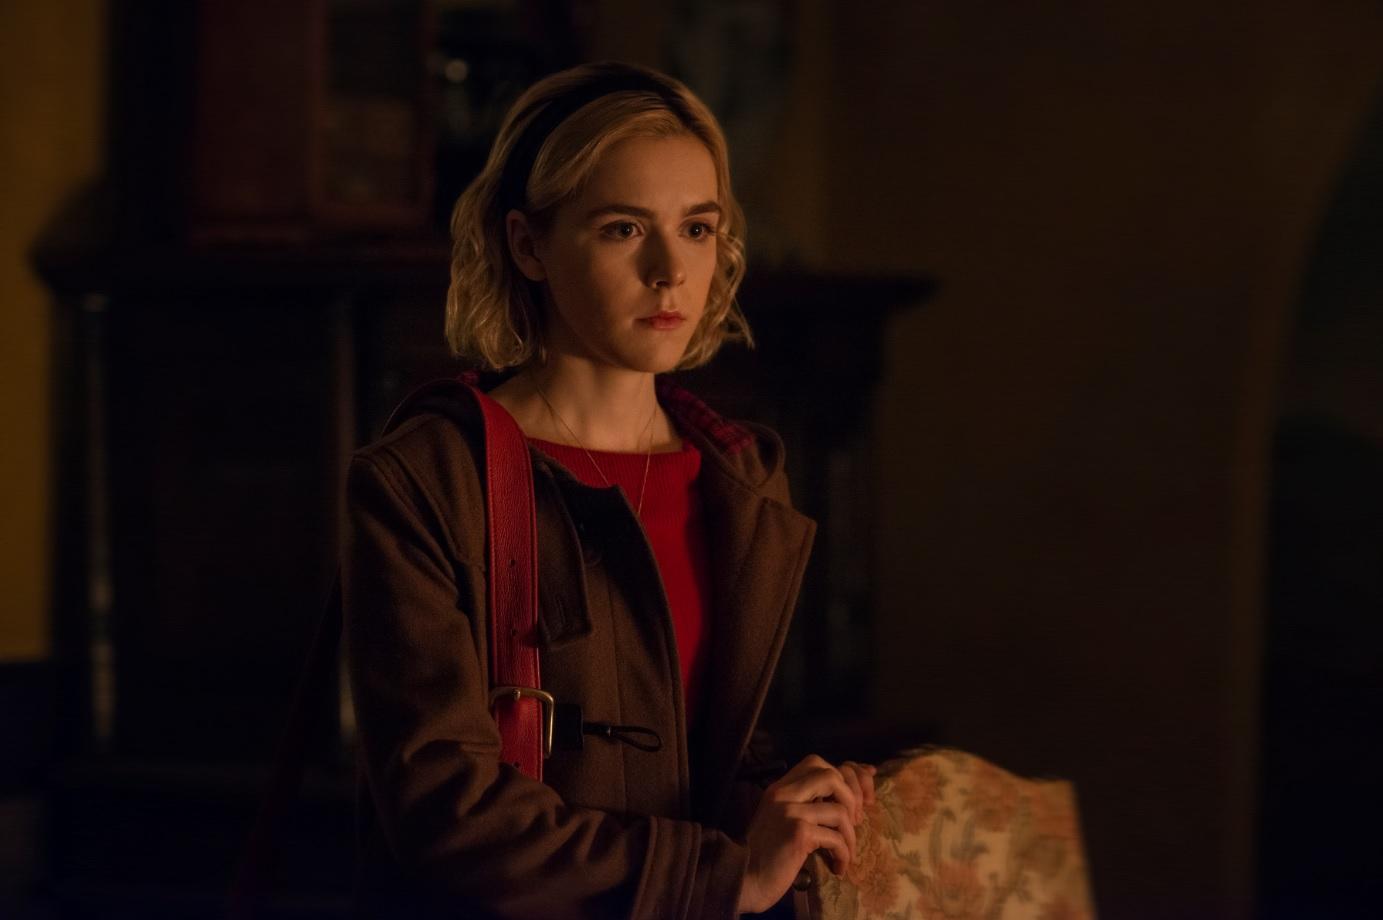 Netflix divulga primeiro teaser de O Mundo Sombrio de Sabrina